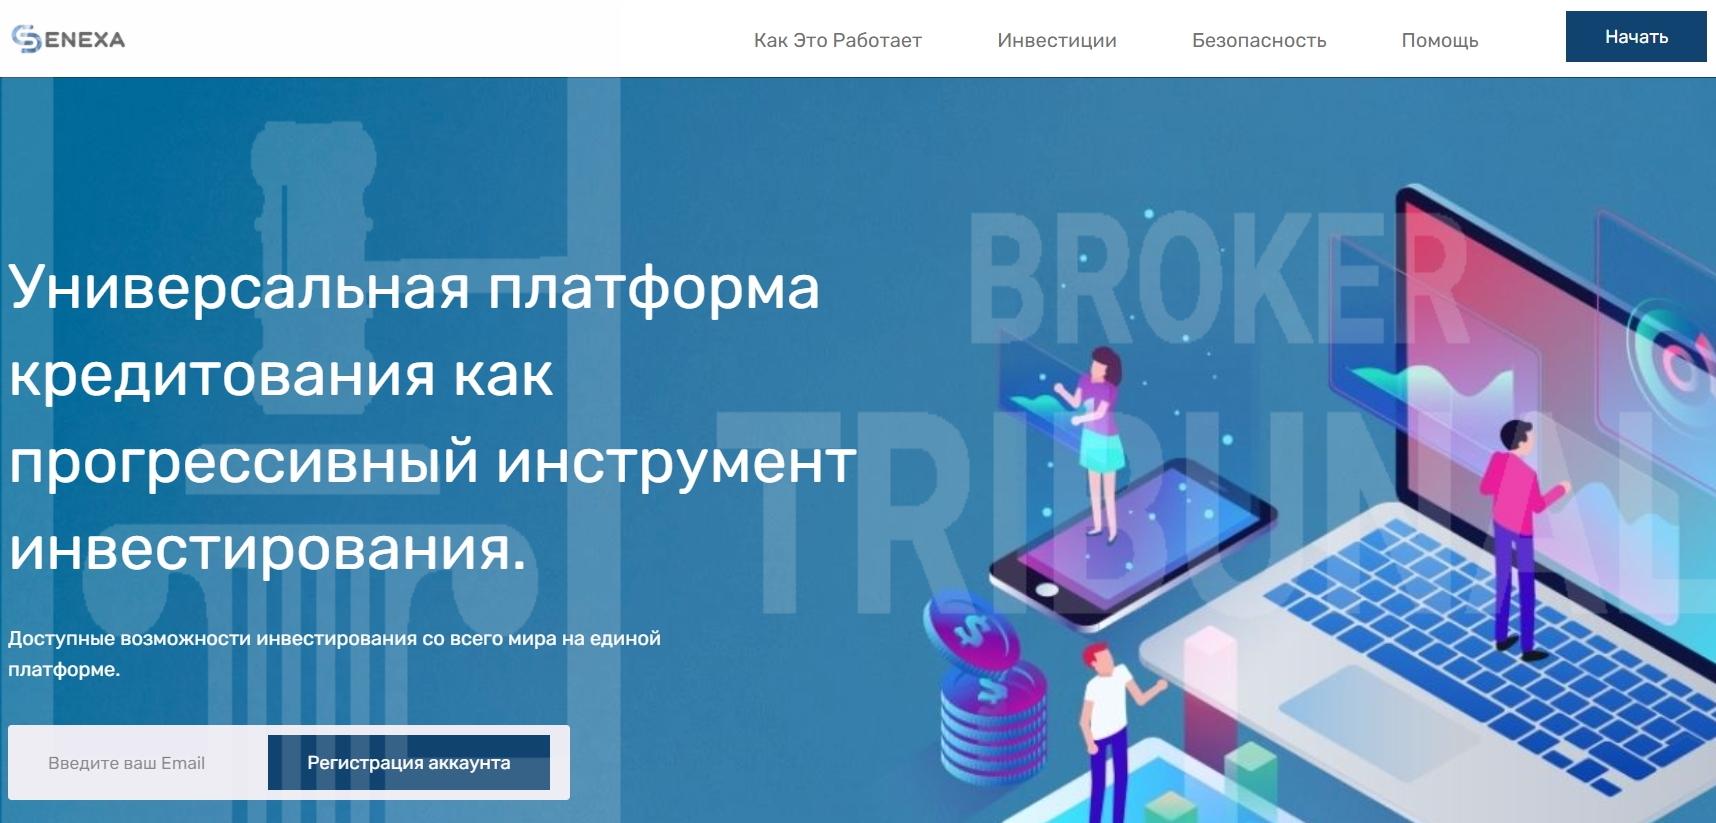 Инвестиции в скам-проект Senexa